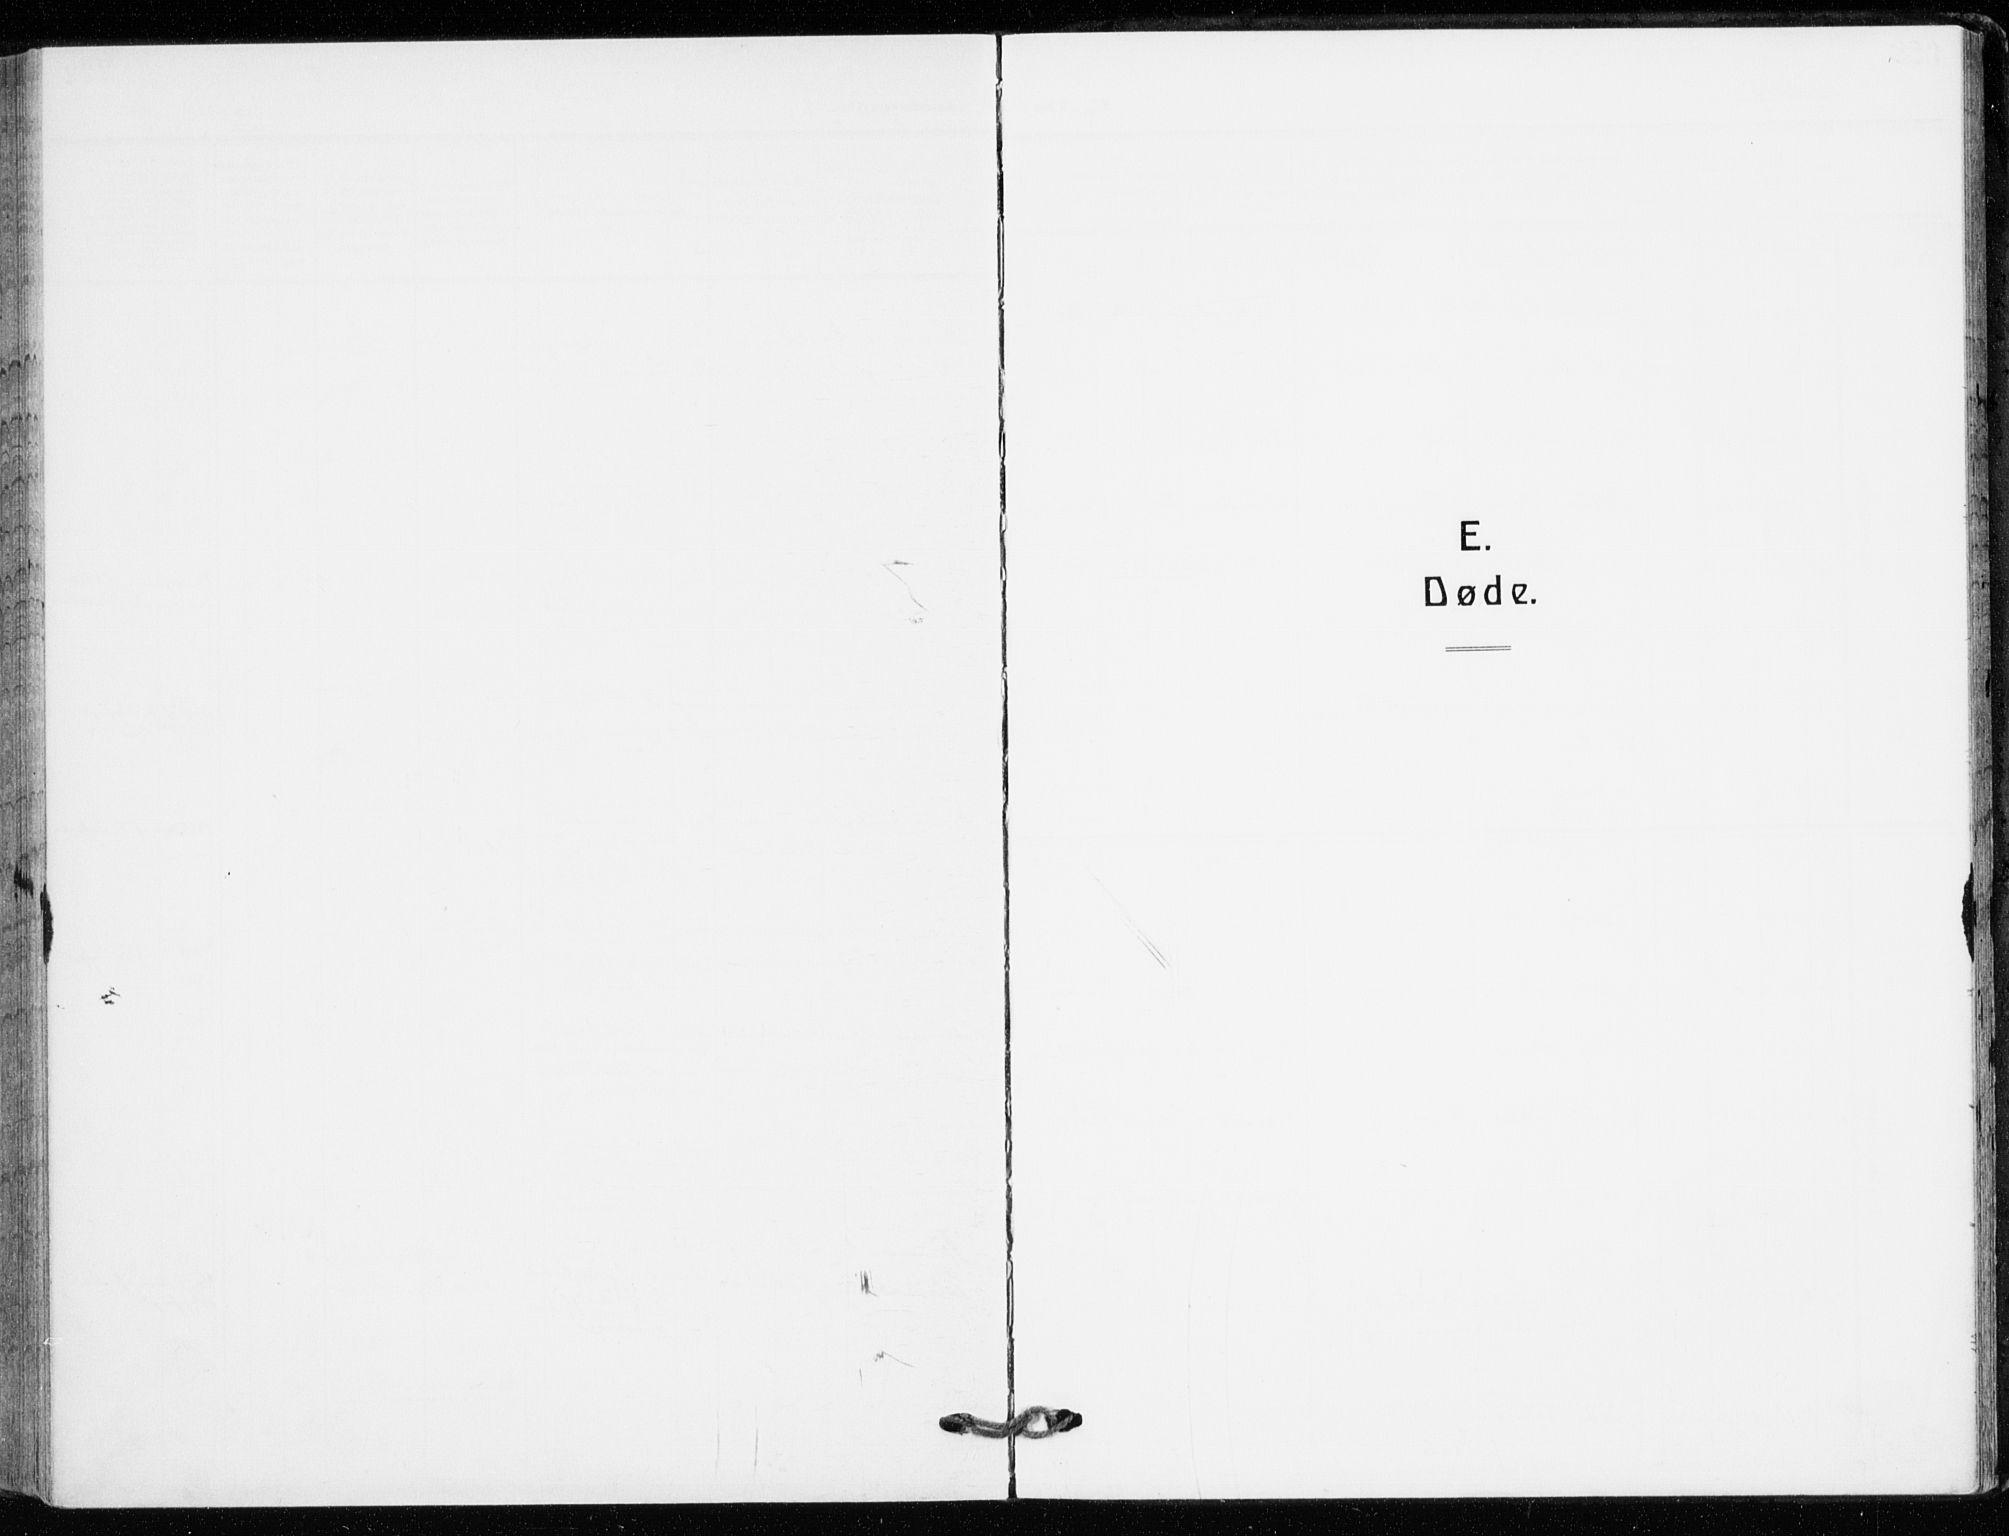 SAO, Kampen prestekontor Kirkebøker, F/Fa/L0013: Ministerialbok nr. I 13, 1917-1922